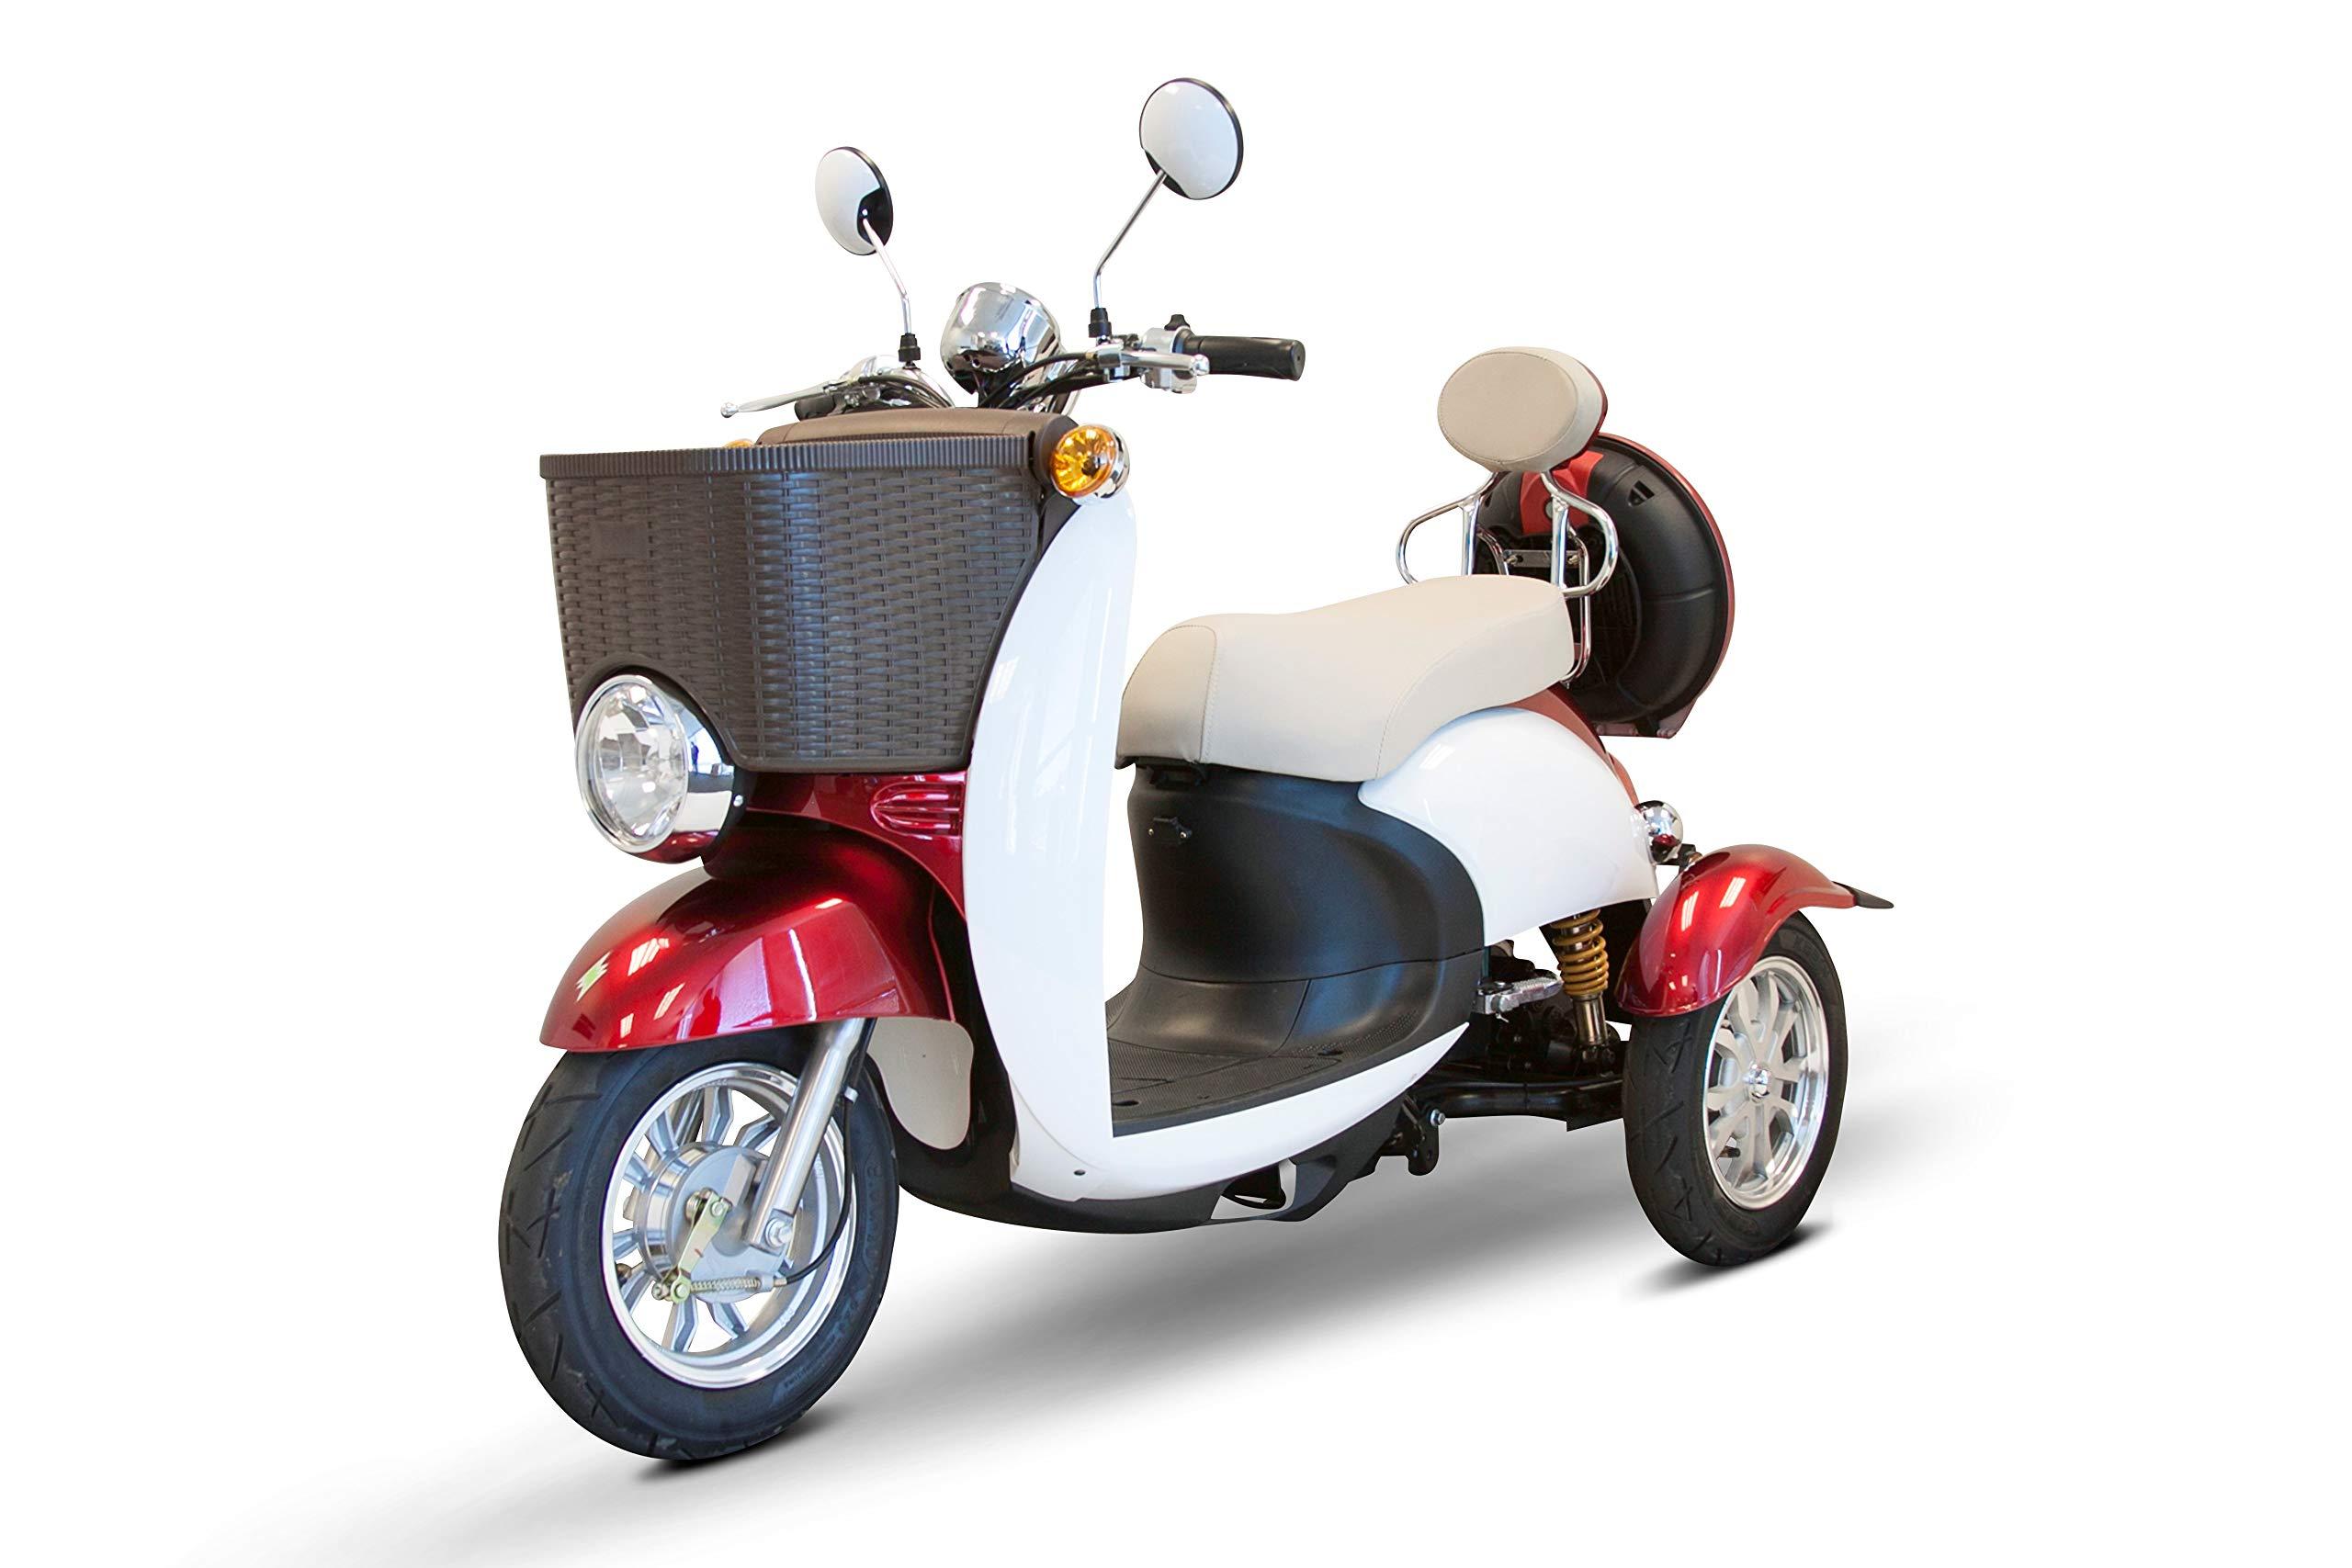 E-Wheels - EW-11 Sport Euro Type Scooter - 3-Wheel - Red/White by eWheels